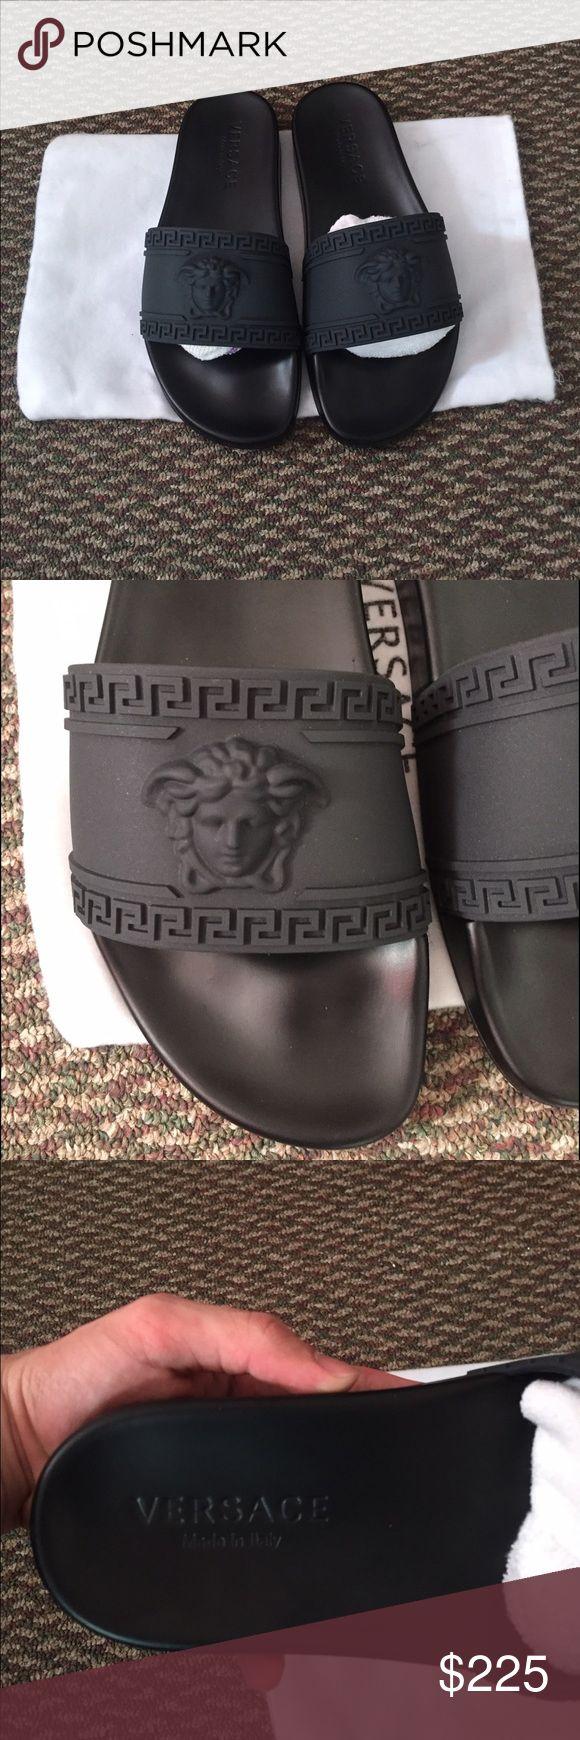 Versace Medusa Black Side Beach Sandals Size 9